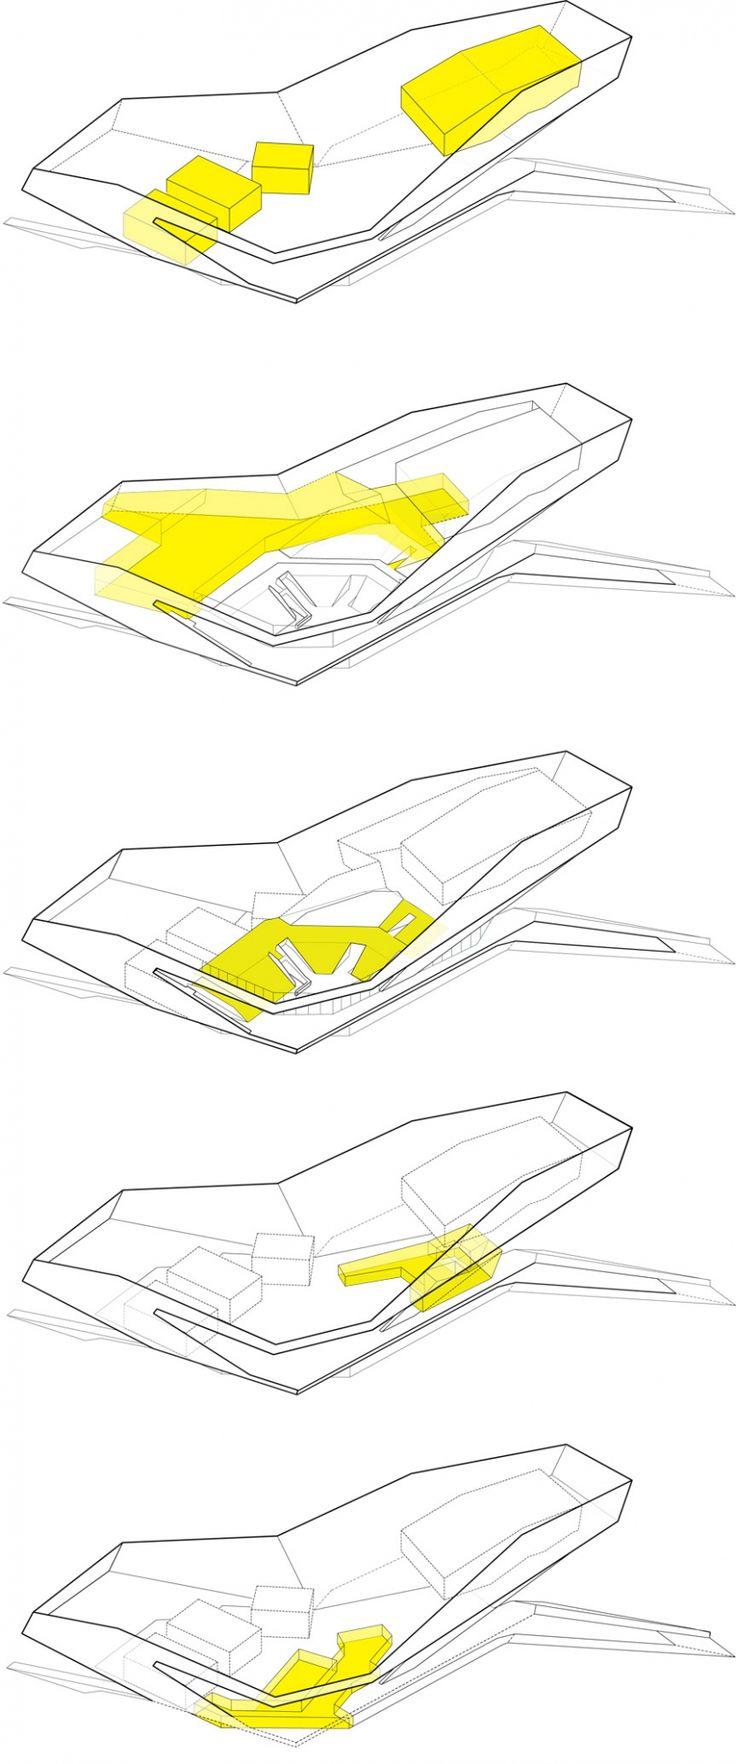 delugan meissl eye film institute diagrams pinterest diagram cheap shoes and films. Black Bedroom Furniture Sets. Home Design Ideas